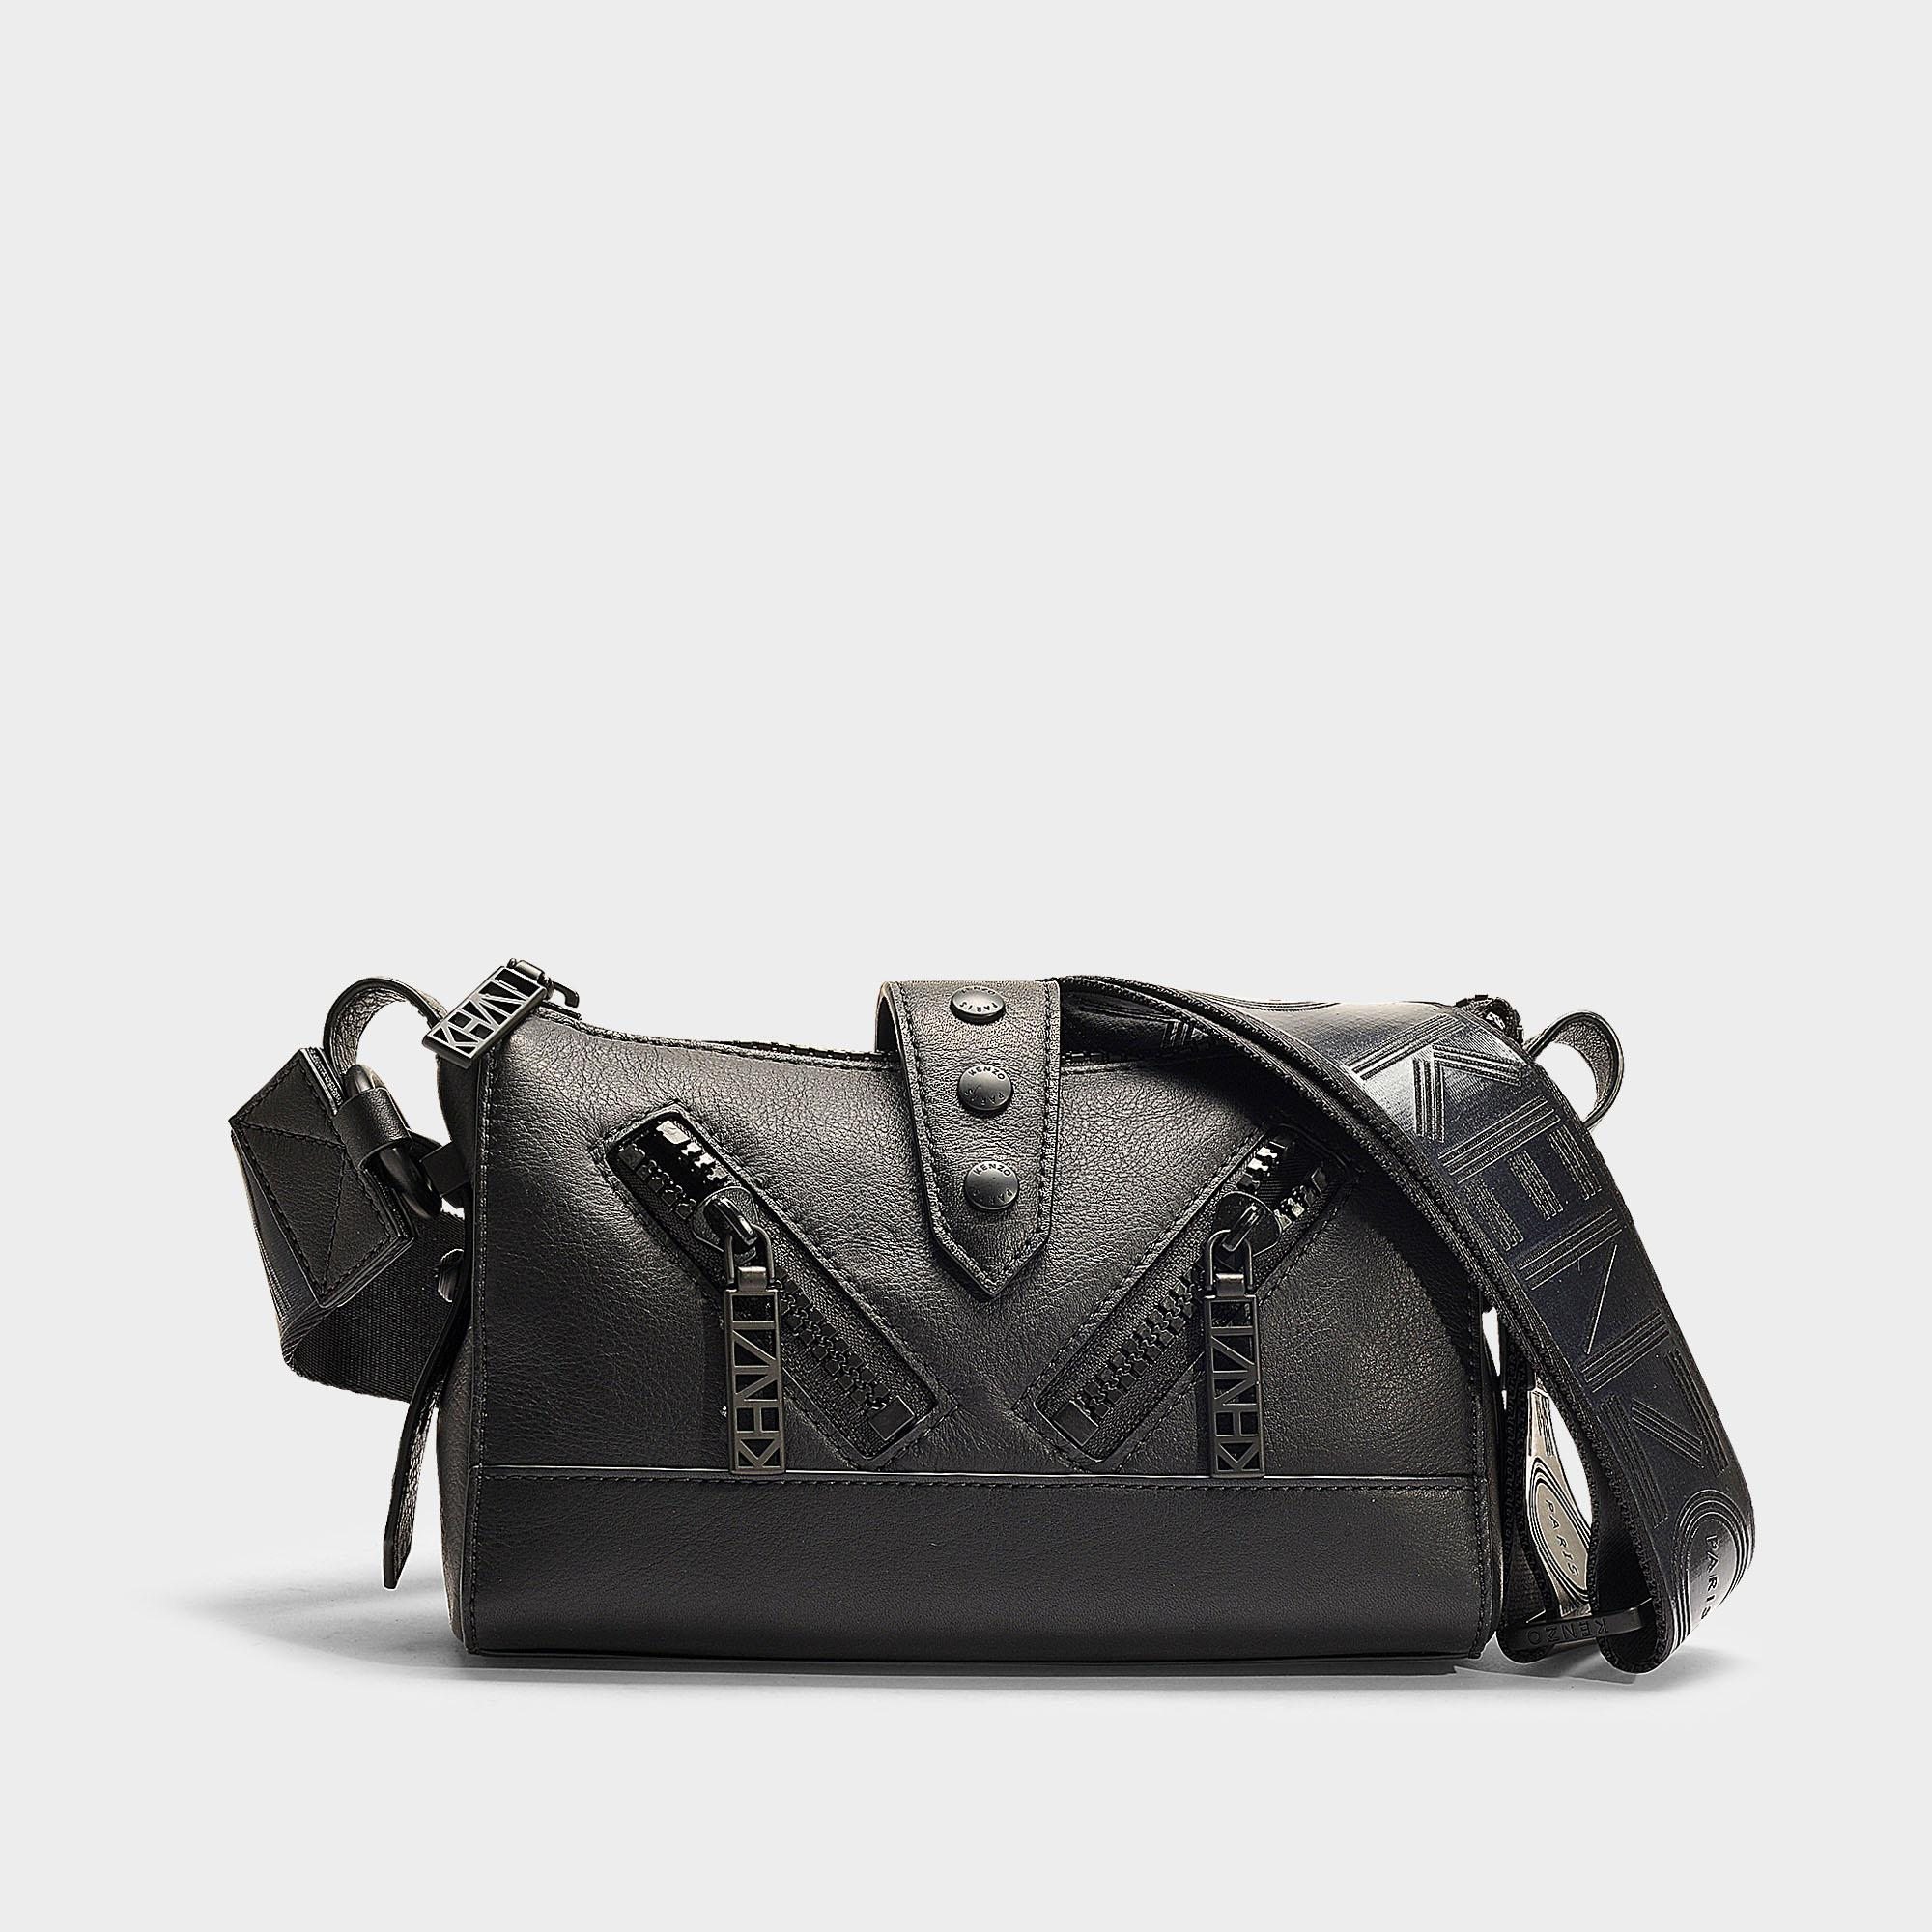 Kenzo Kalifornia Mini Shoulder Bag In Black Calfskin in Black - Lyst a37d8e255cf